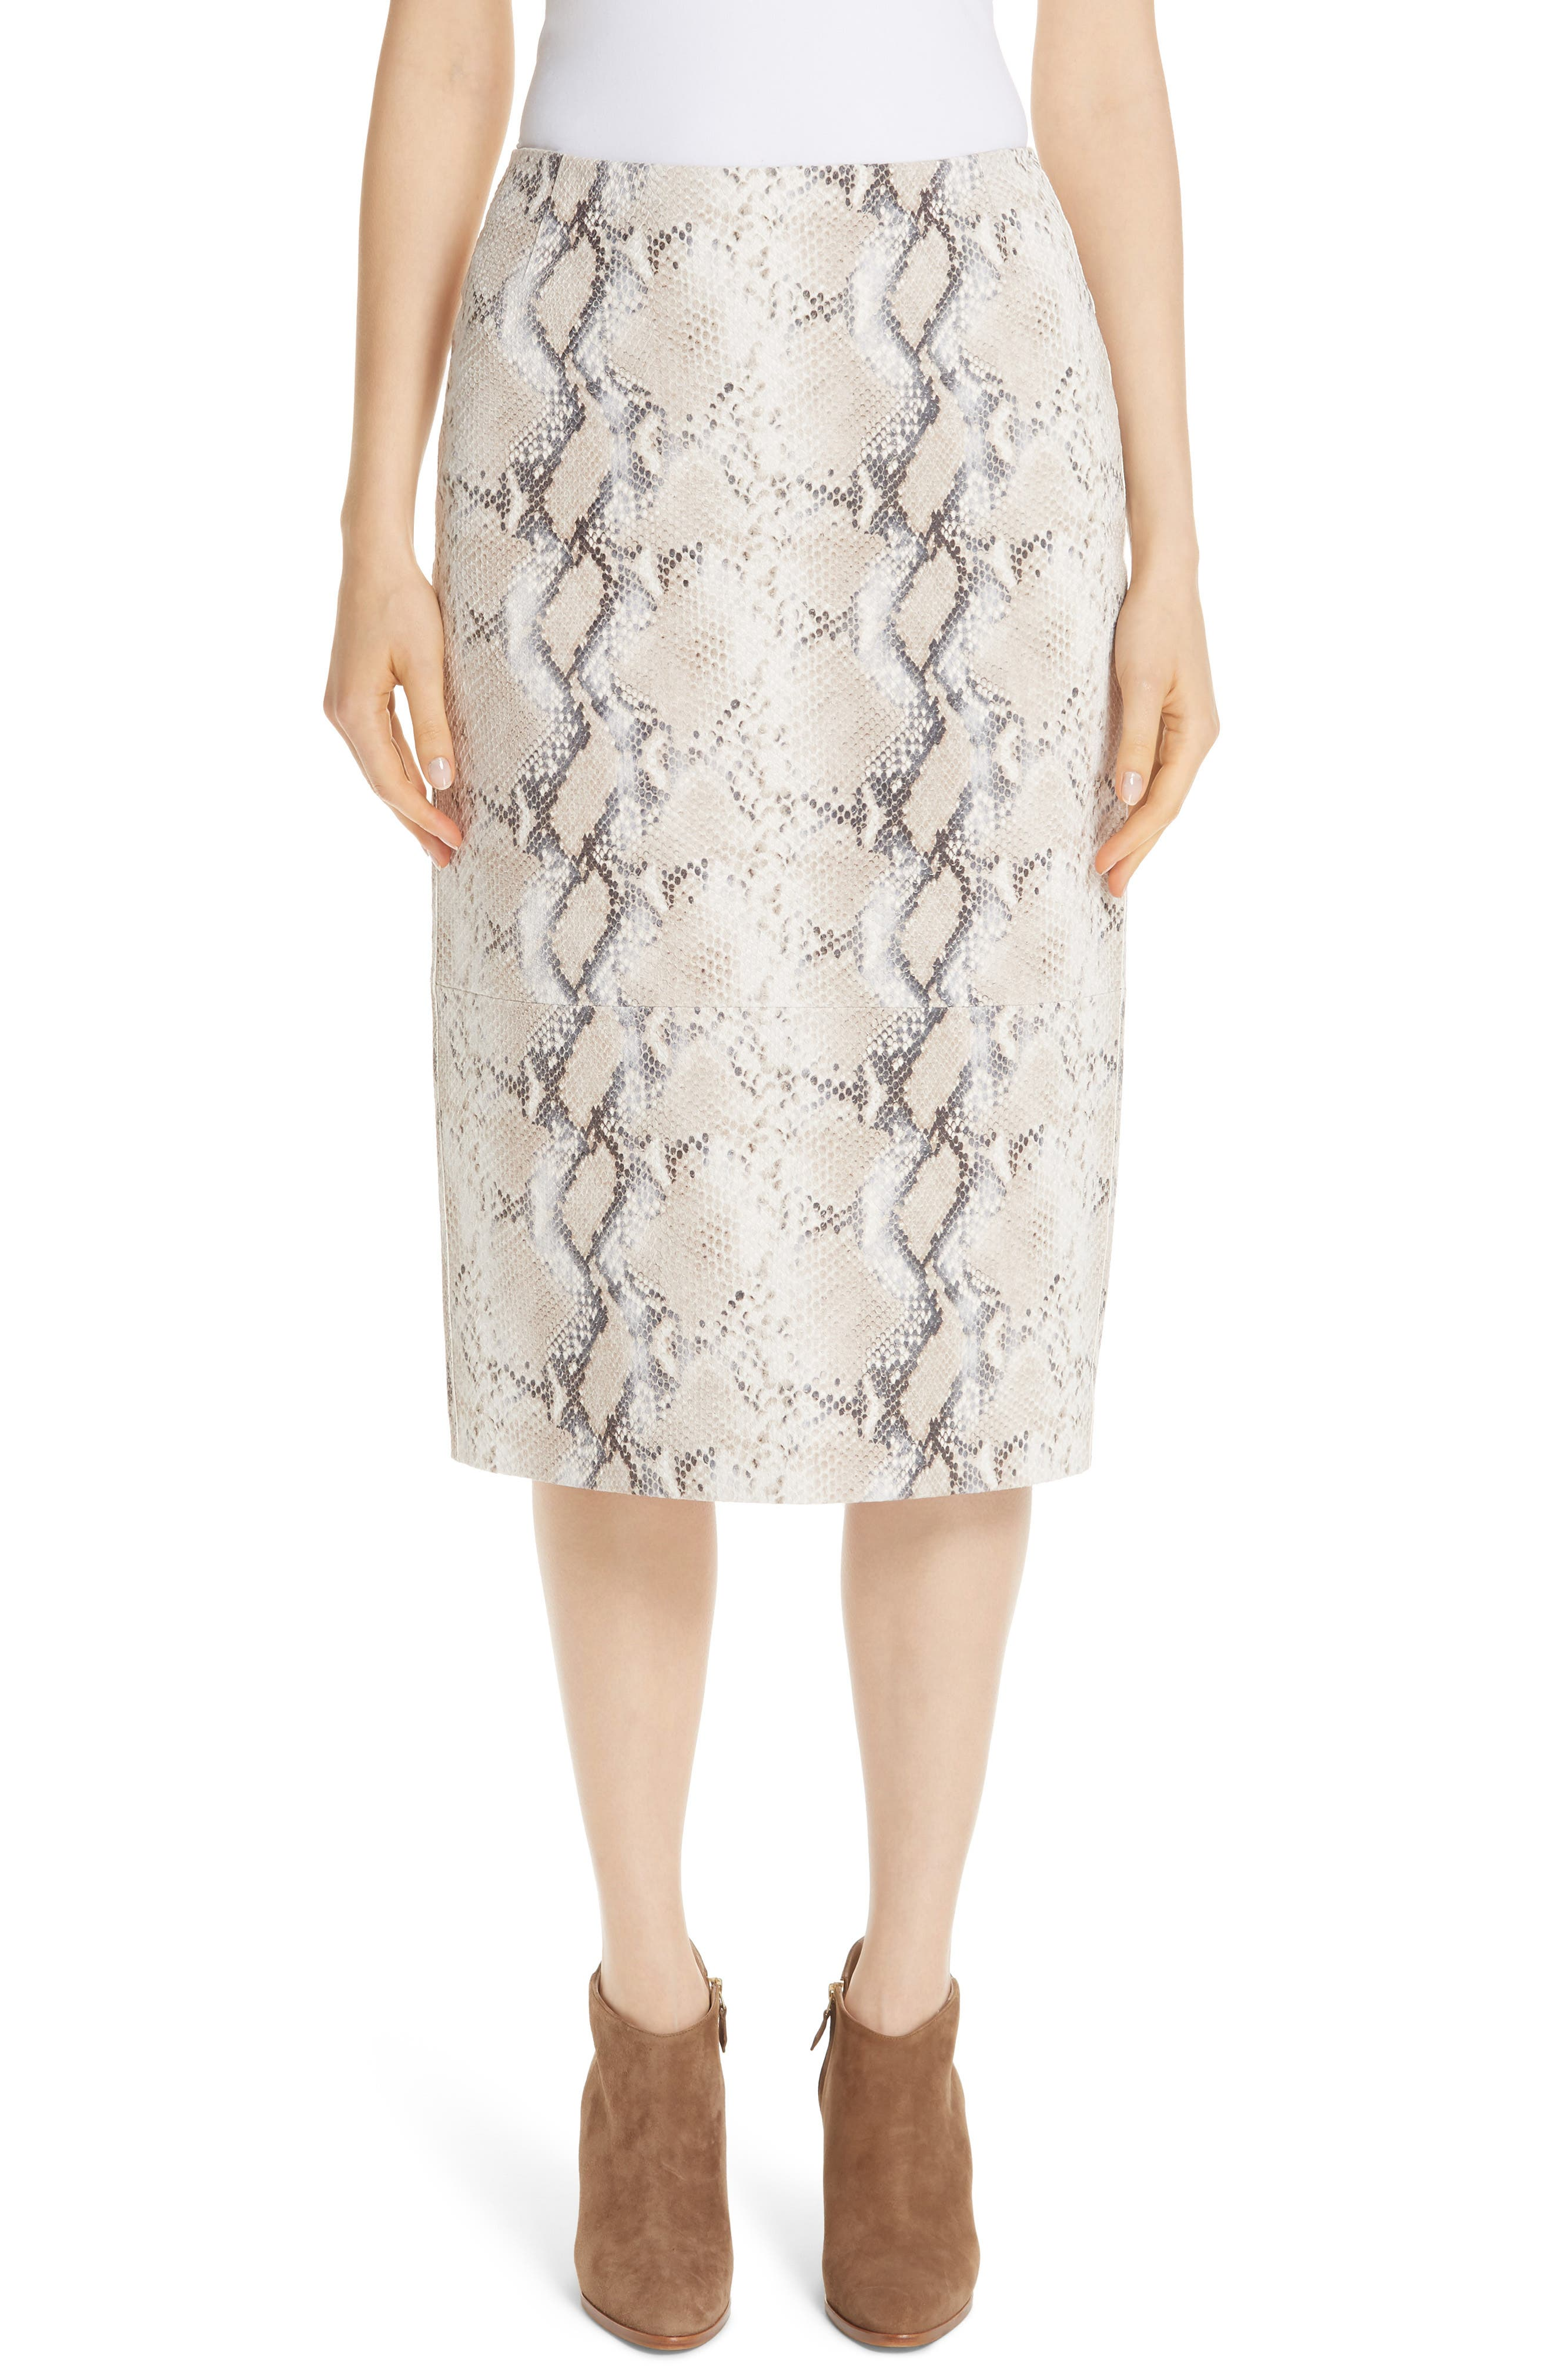 Casey Diamondback Snake-Print Suede Skirt in Taupe Multi